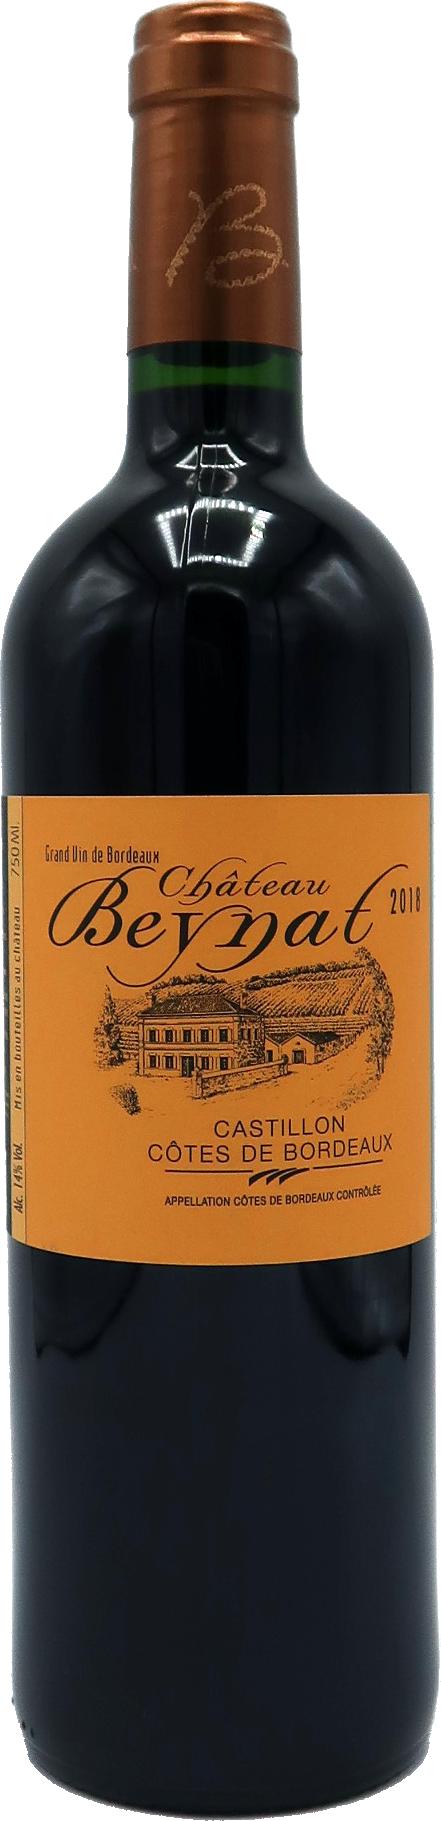 château-beynat-castillon-2018